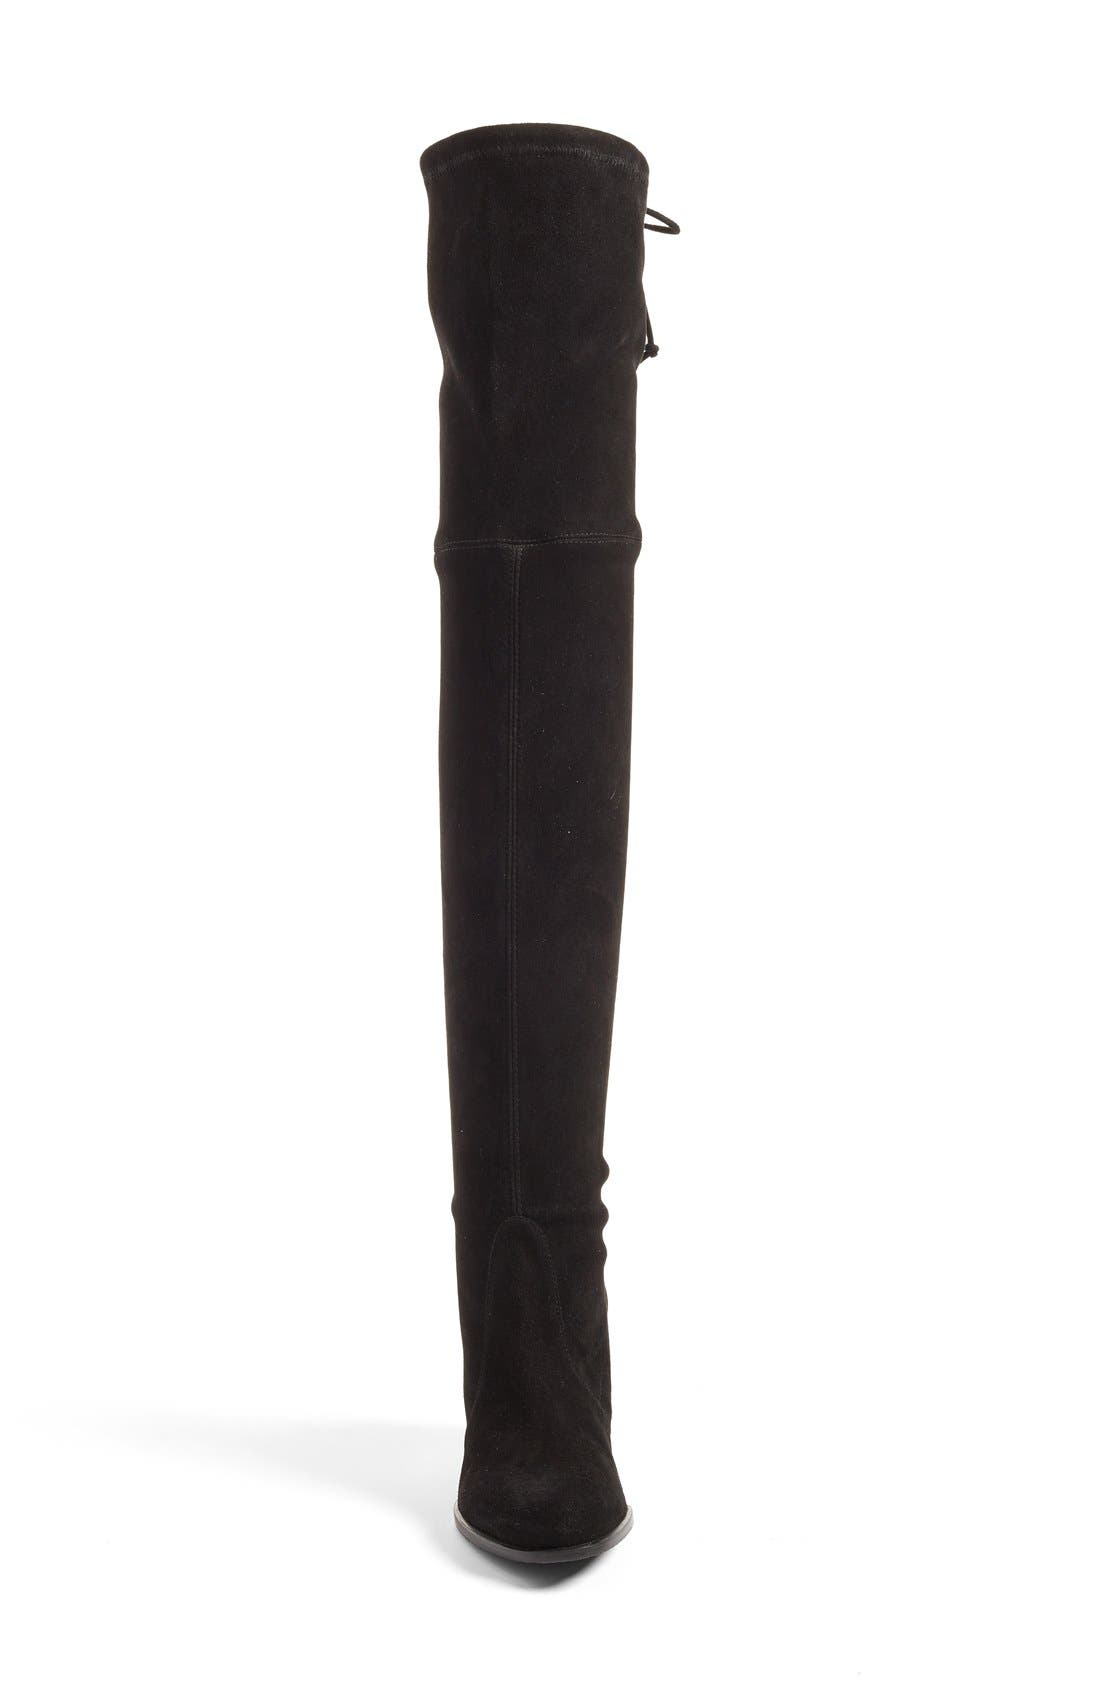 STUART WEITZMAN, Tieland Over the Knee Boot, Alternate thumbnail 4, color, BLACK SUEDE